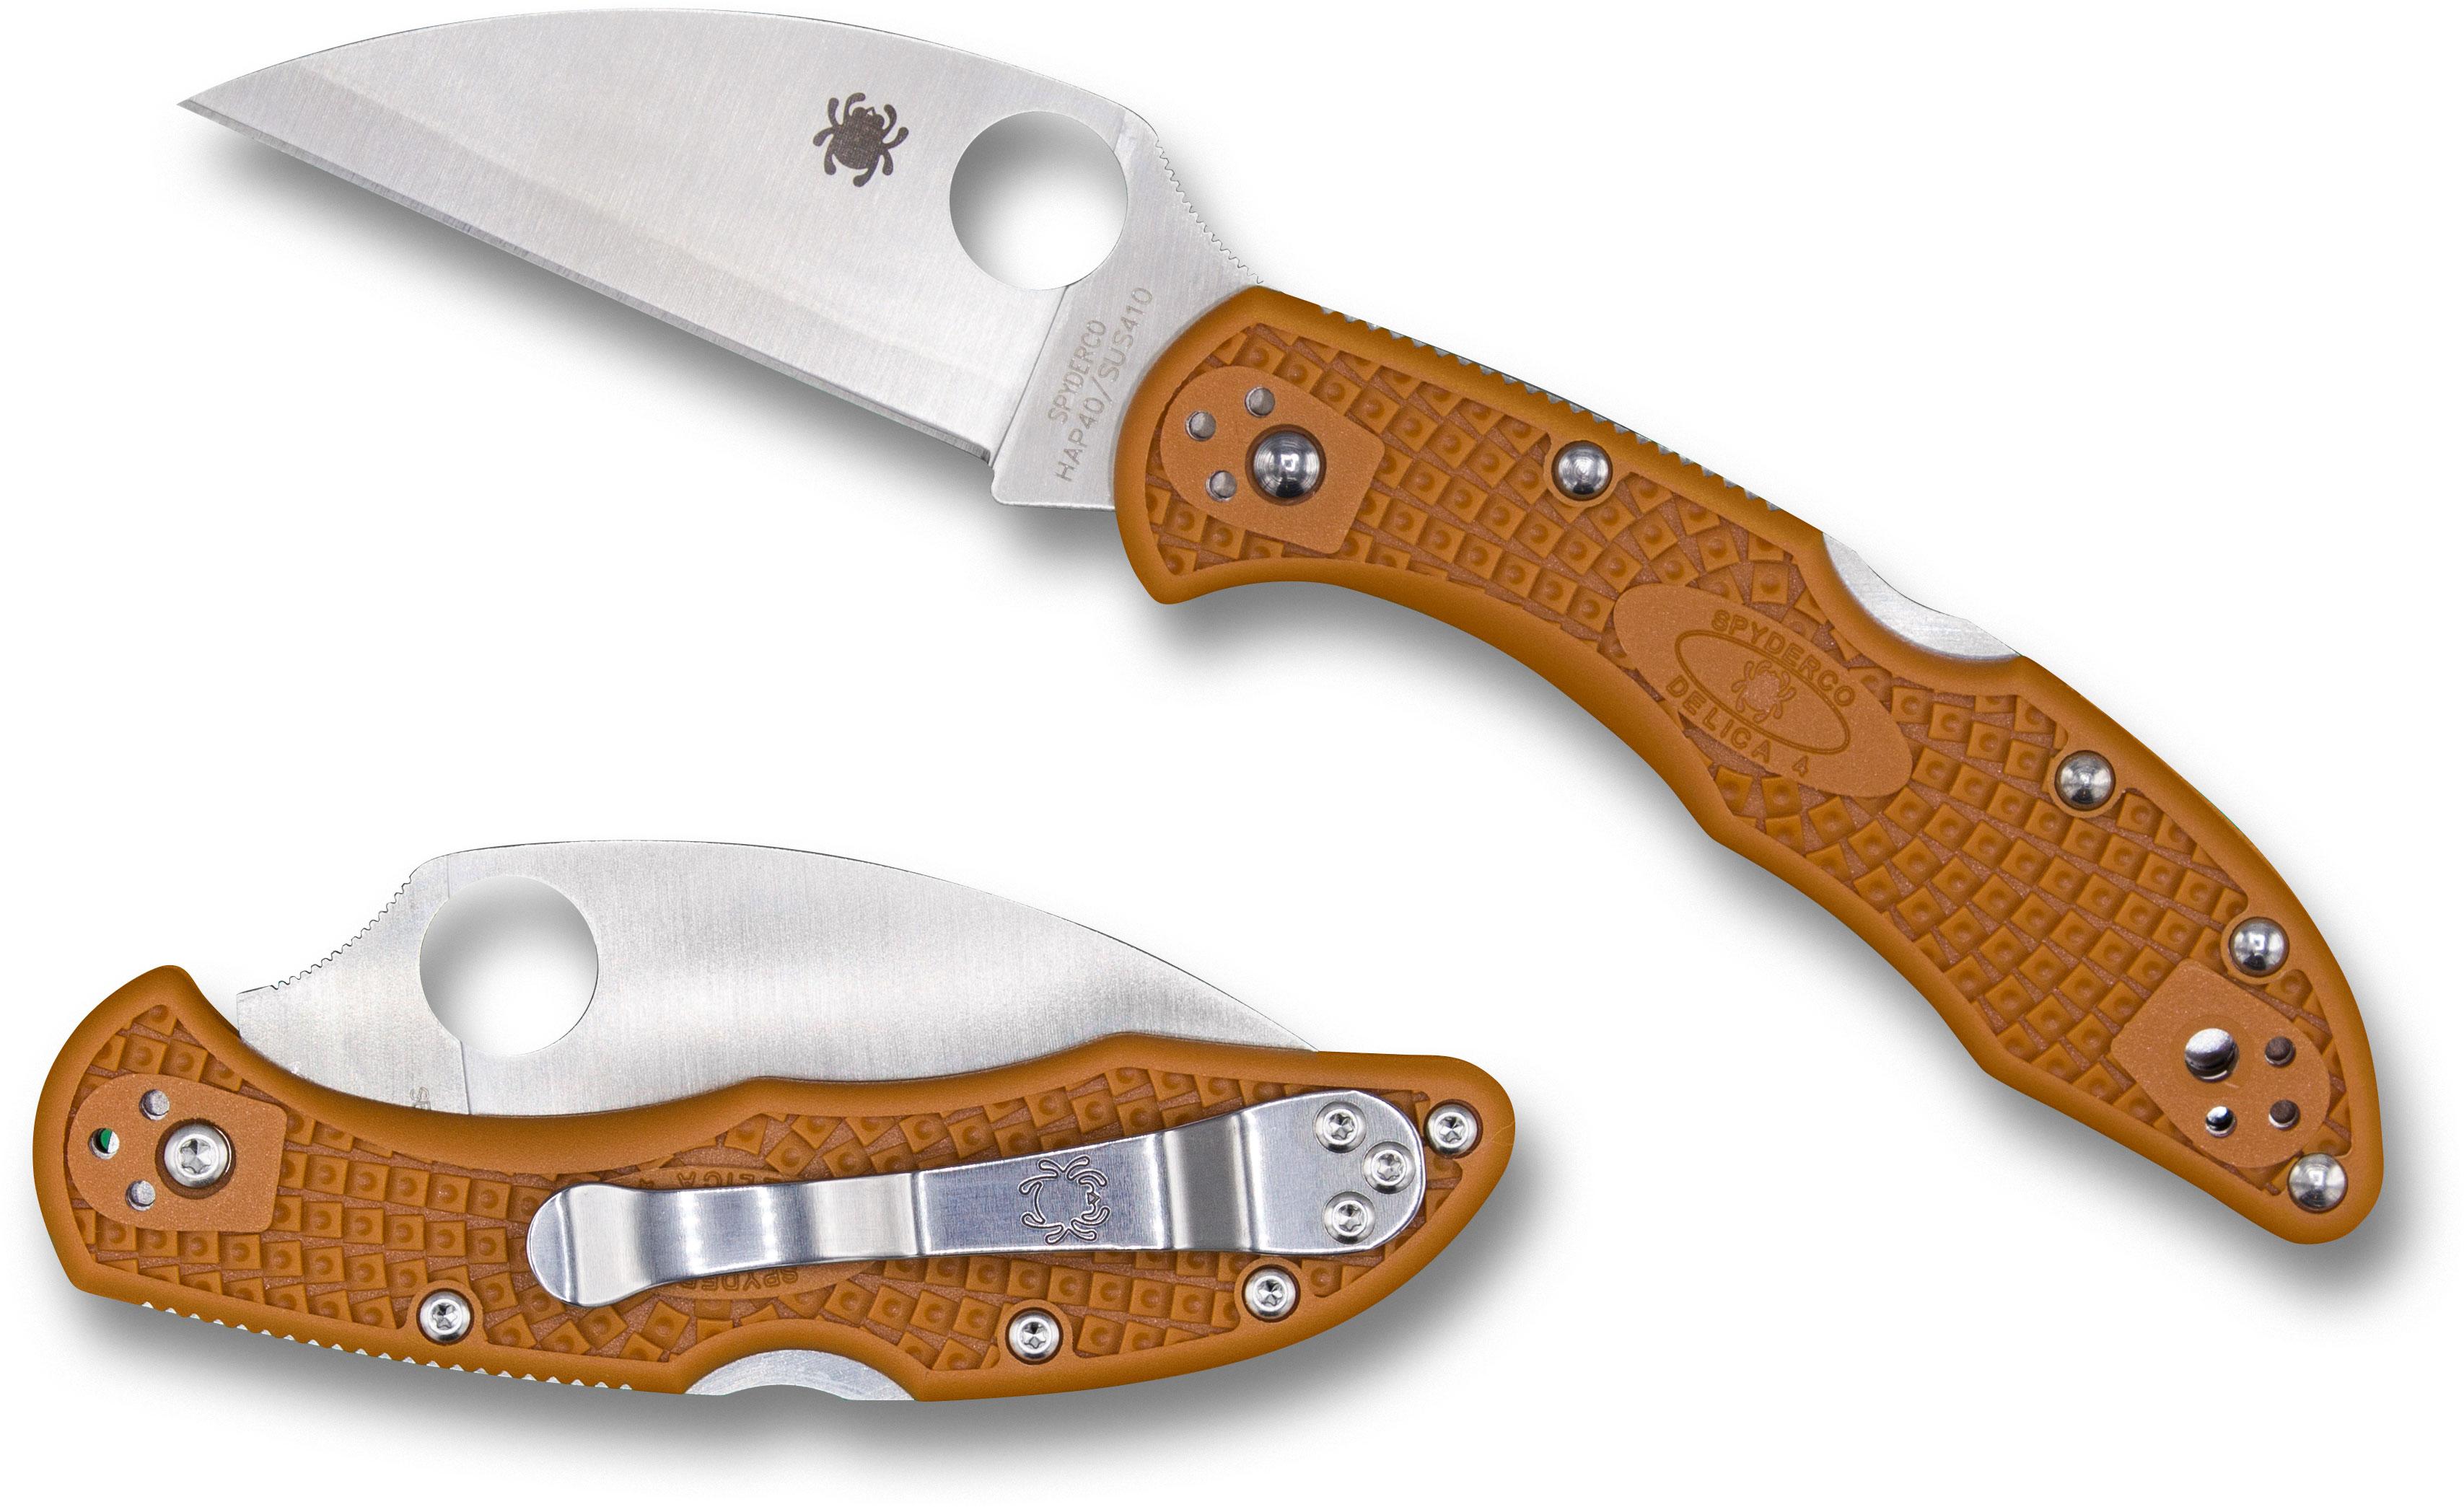 Spyderco Delica 4 Wharncliffe Folding Knife 2.87 inch HAP40 Satin Plain Blade, Burnt Orange FRN Handles, Sprint Run